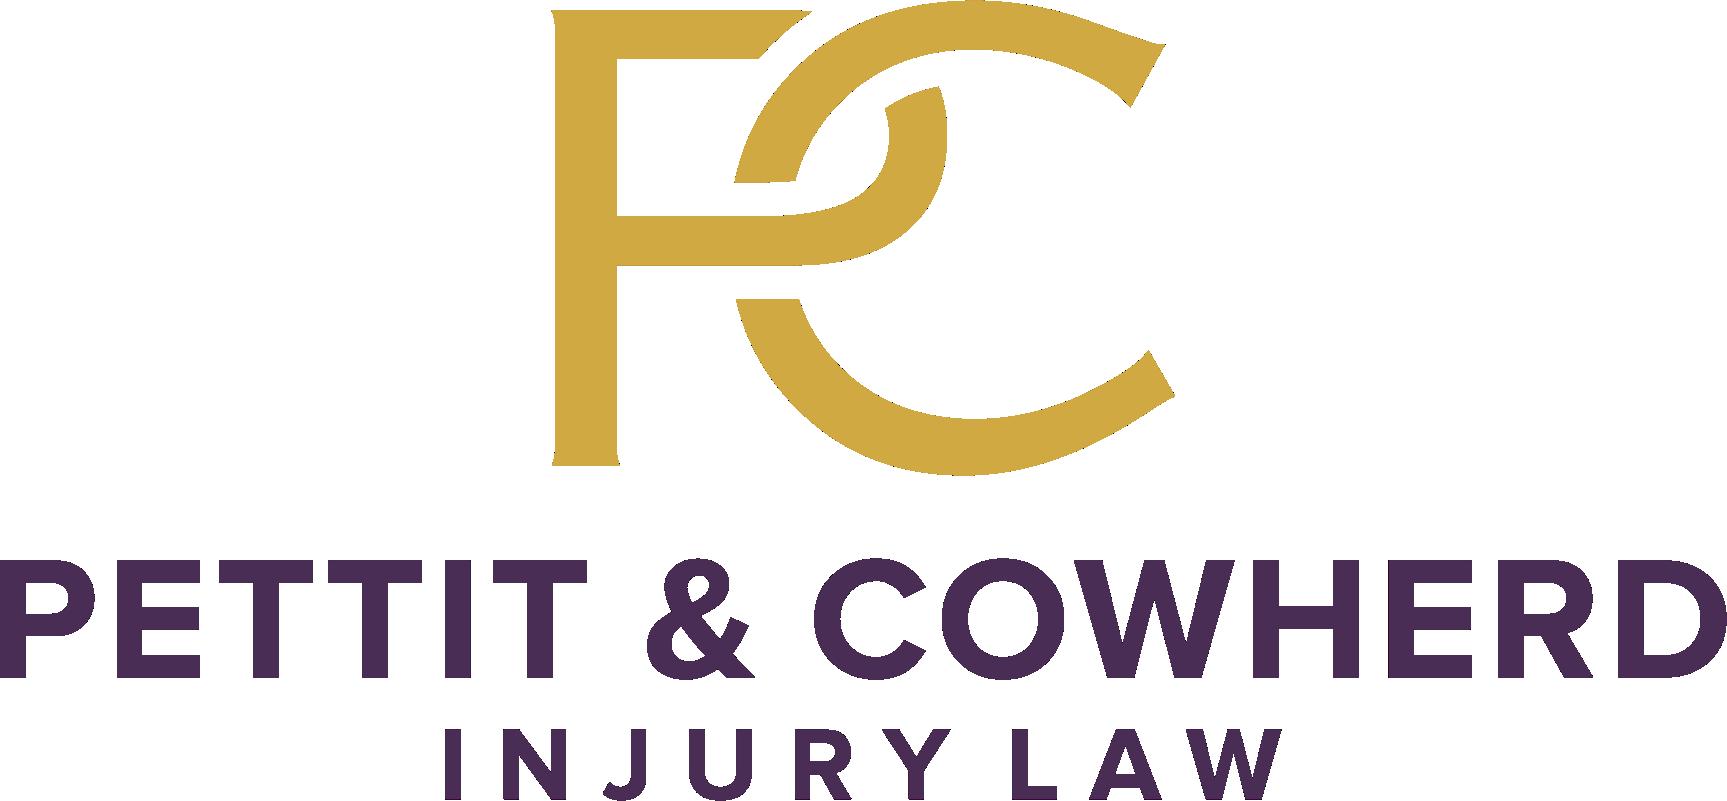 Personal Injury Firm needing modern & powerful logo